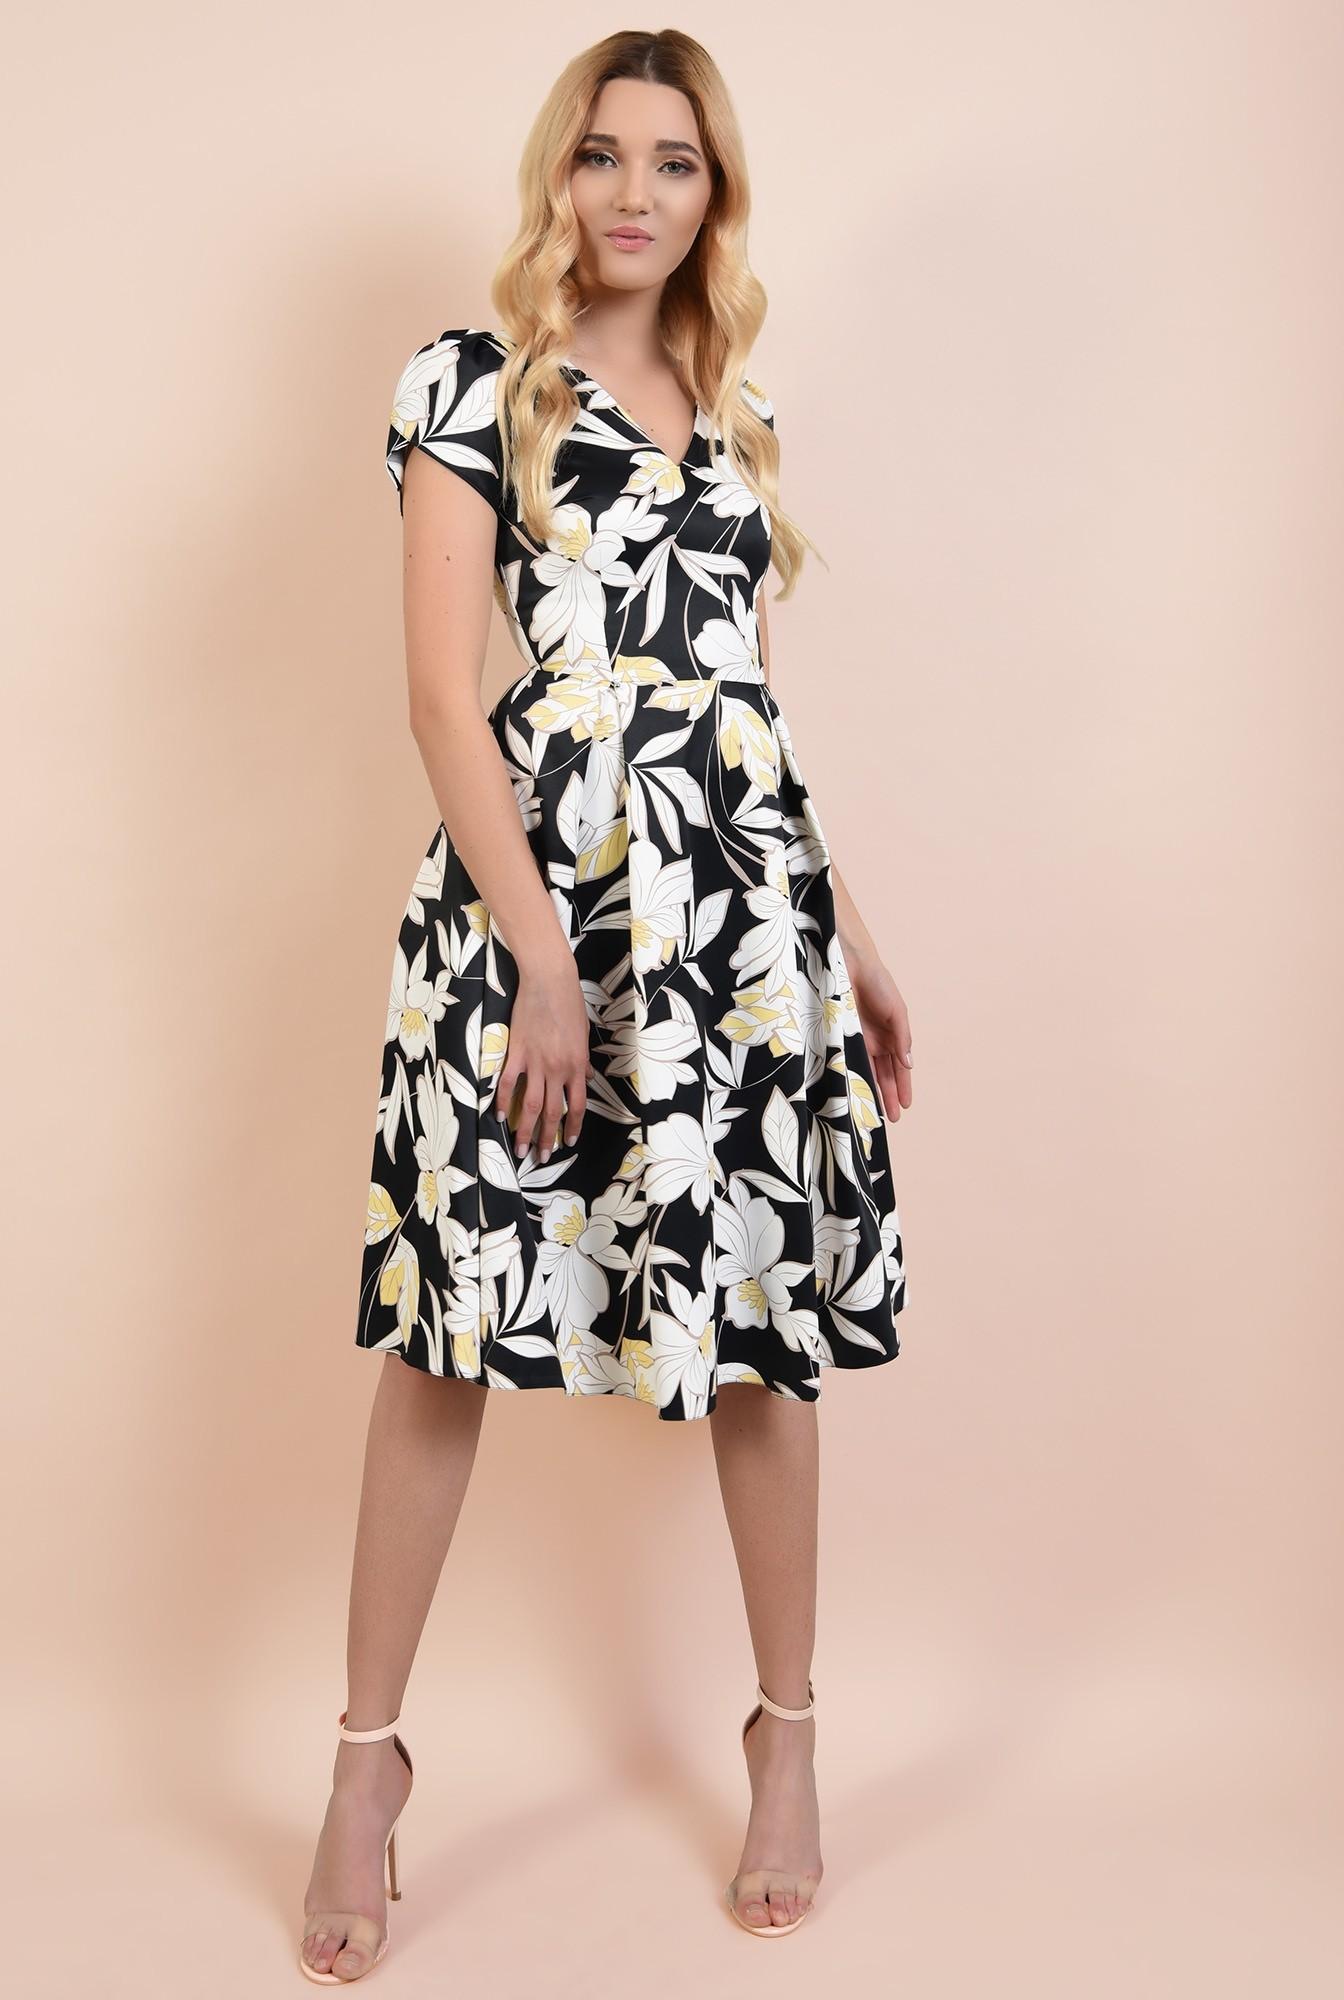 3 - rochie de ocazie, cu motive florale, anchior, maneci bufante lalea